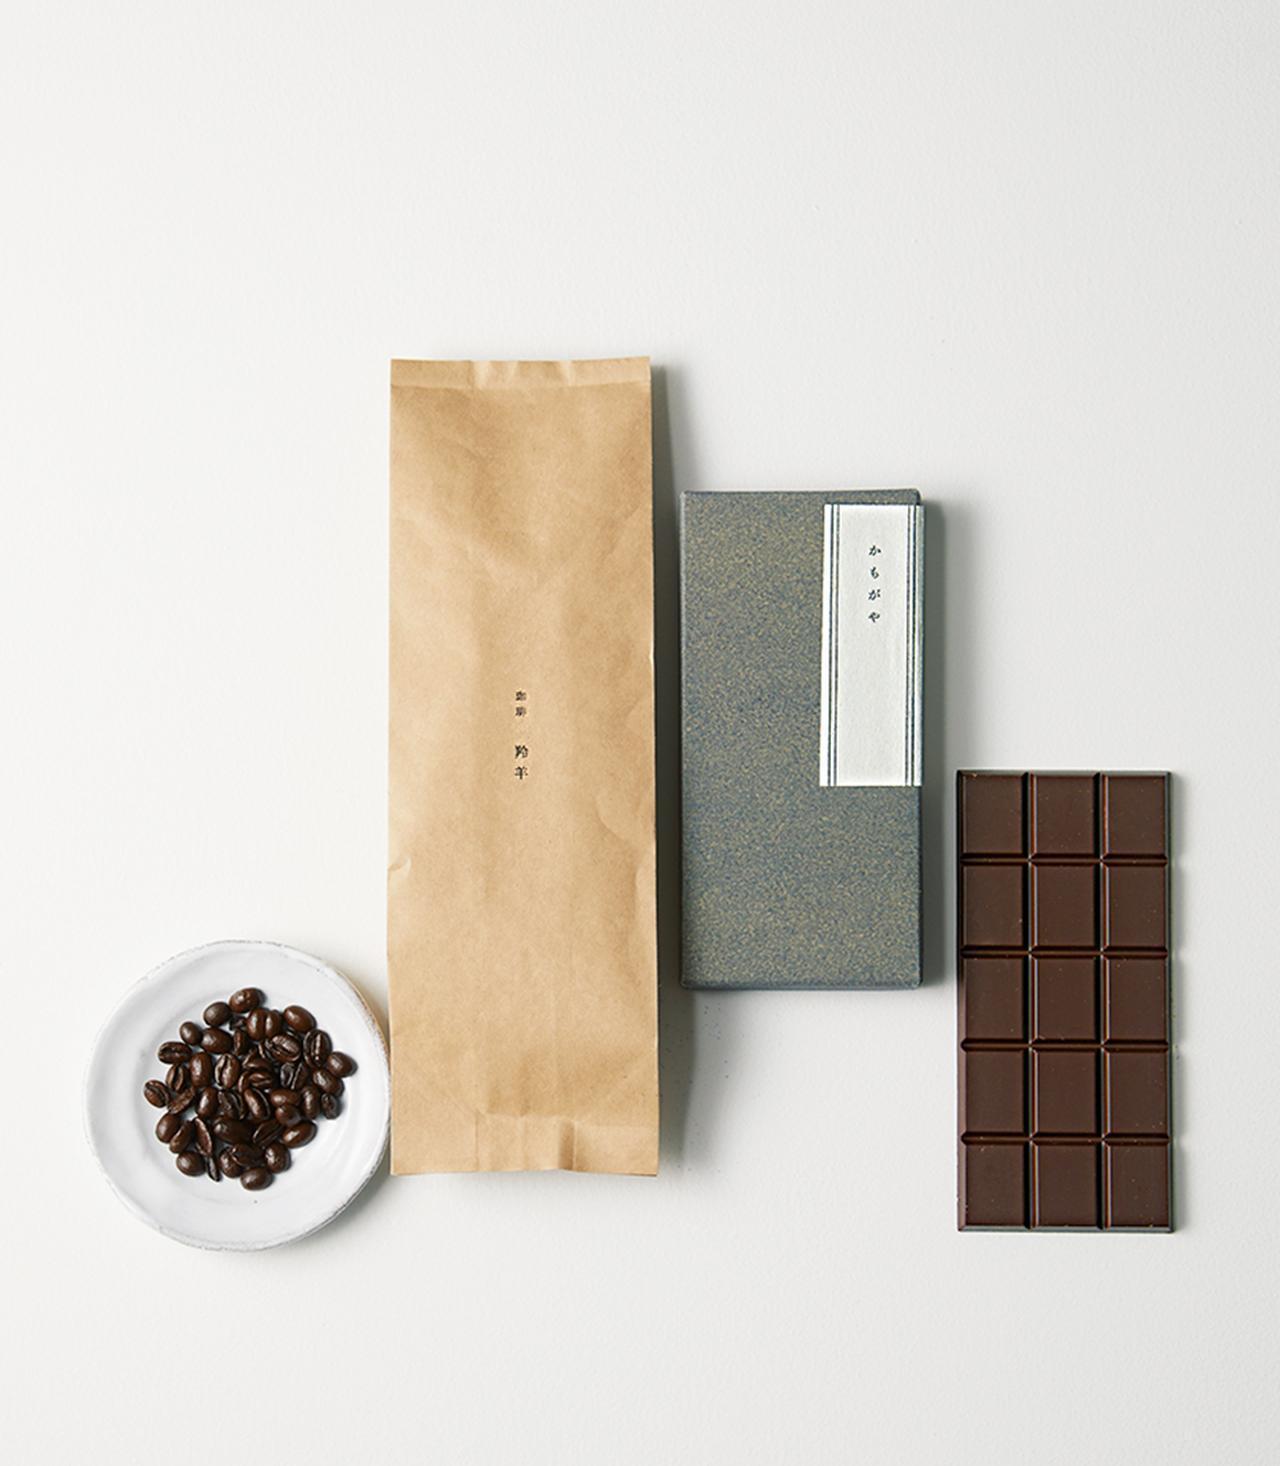 Images : コーヒー(左)、チョコレート(右)